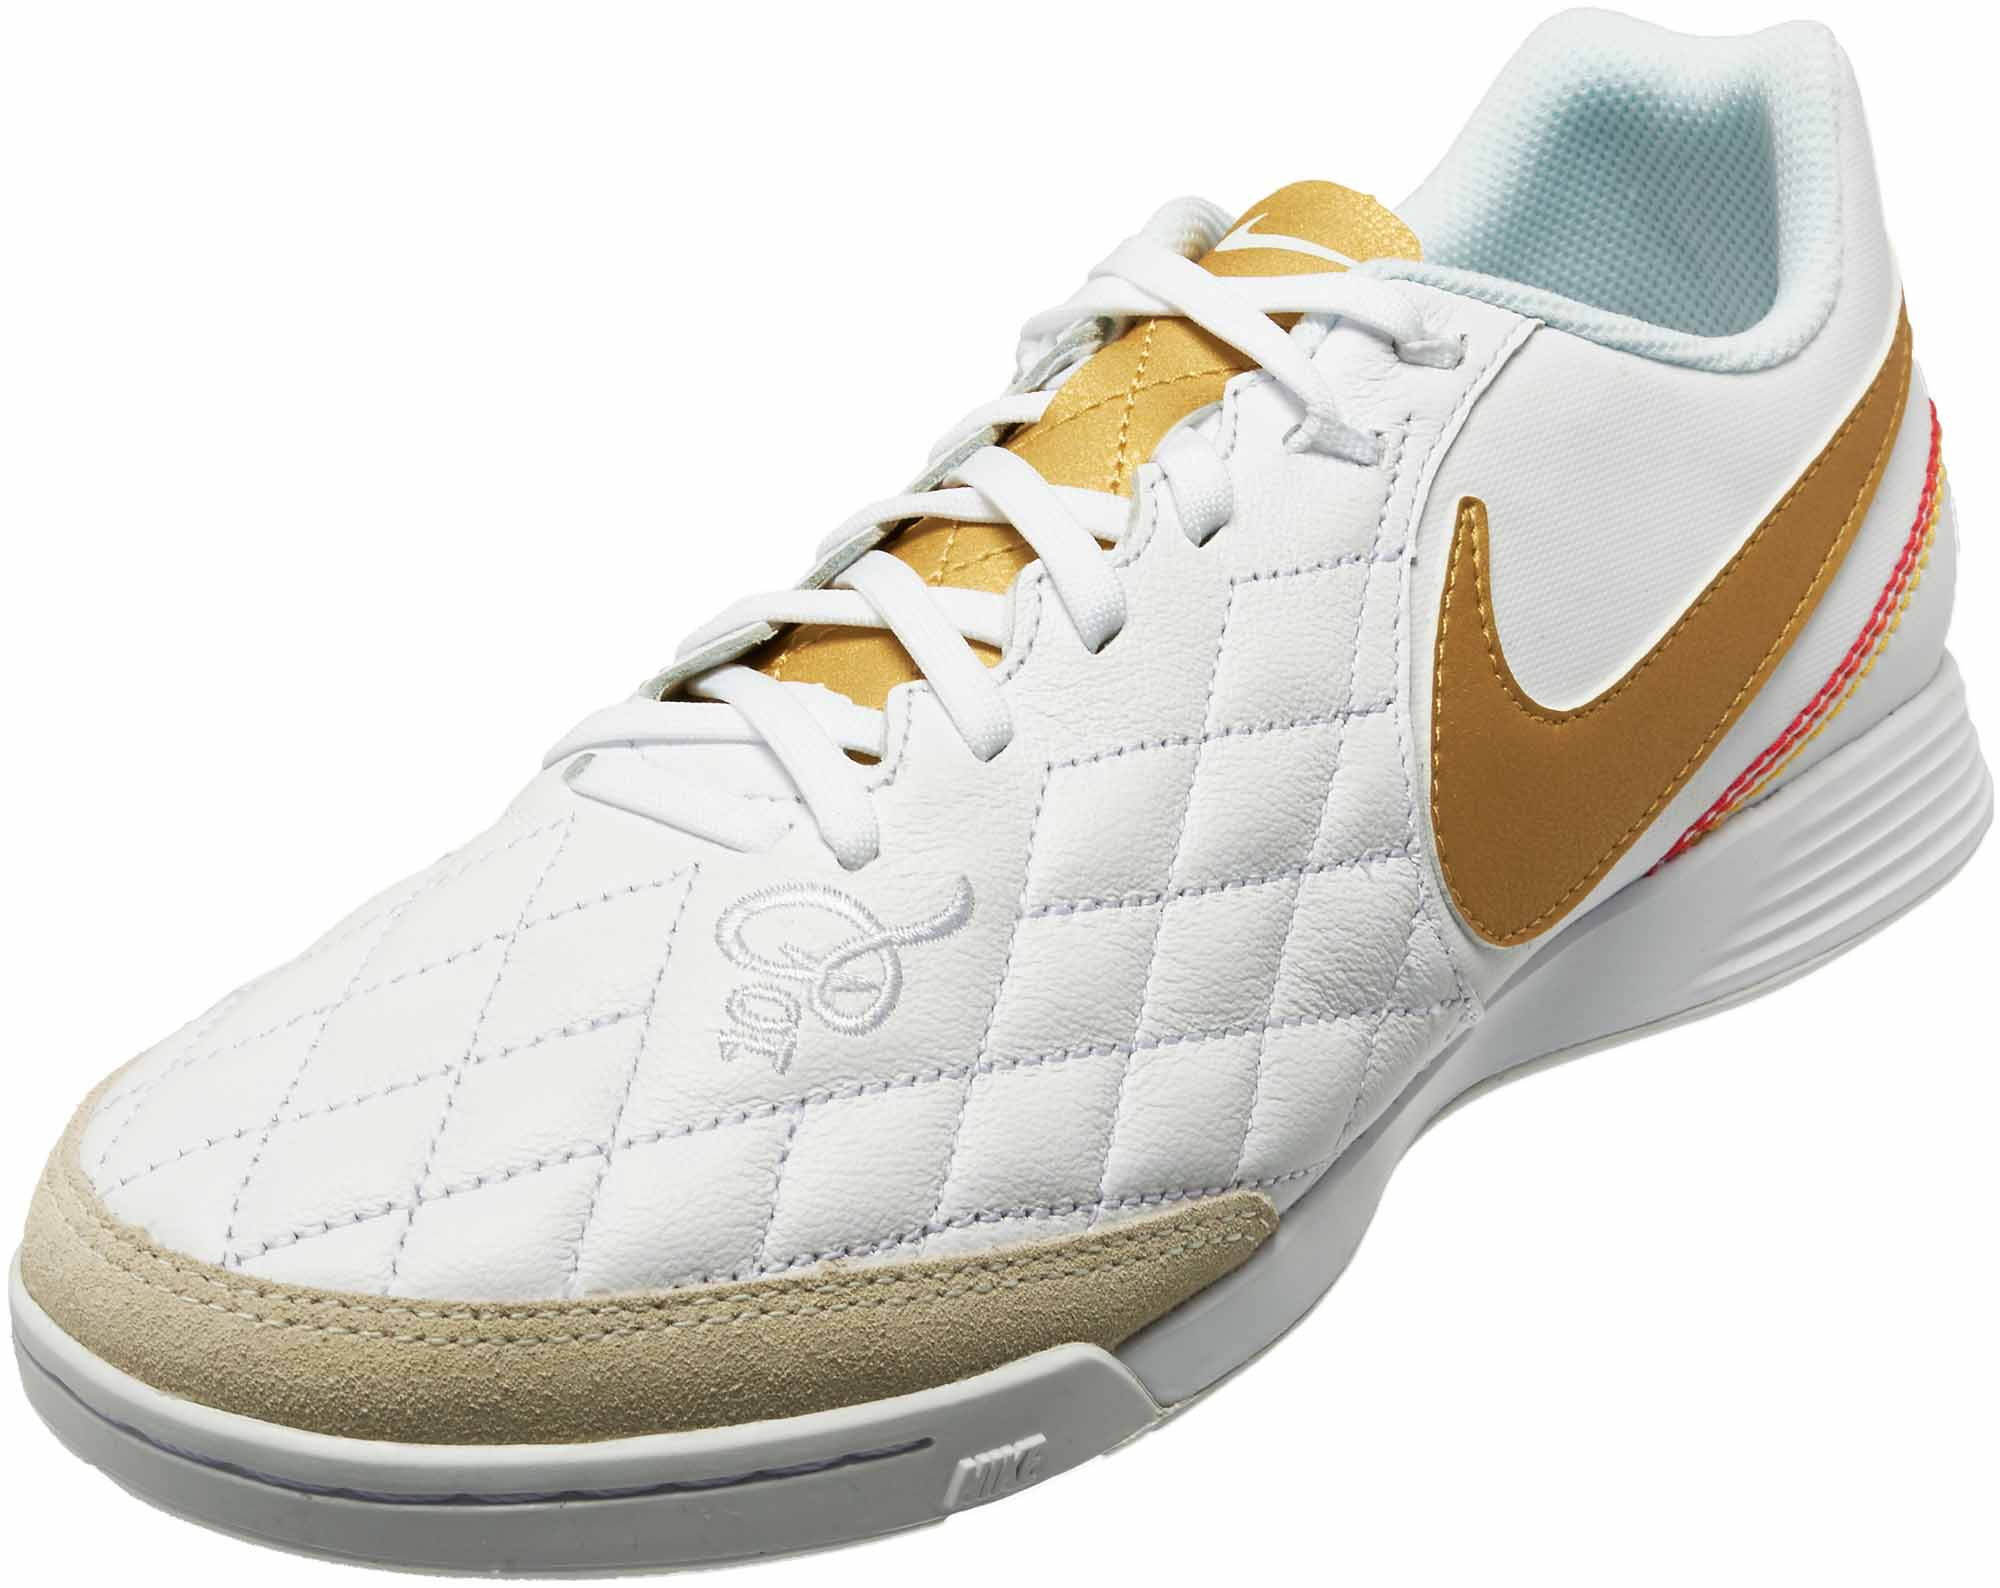 Delicioso temporal defensa  Nike 10R Lunar TiempoX Legend 7 Academy IC - White/Metallic Gold - Soccer  Master